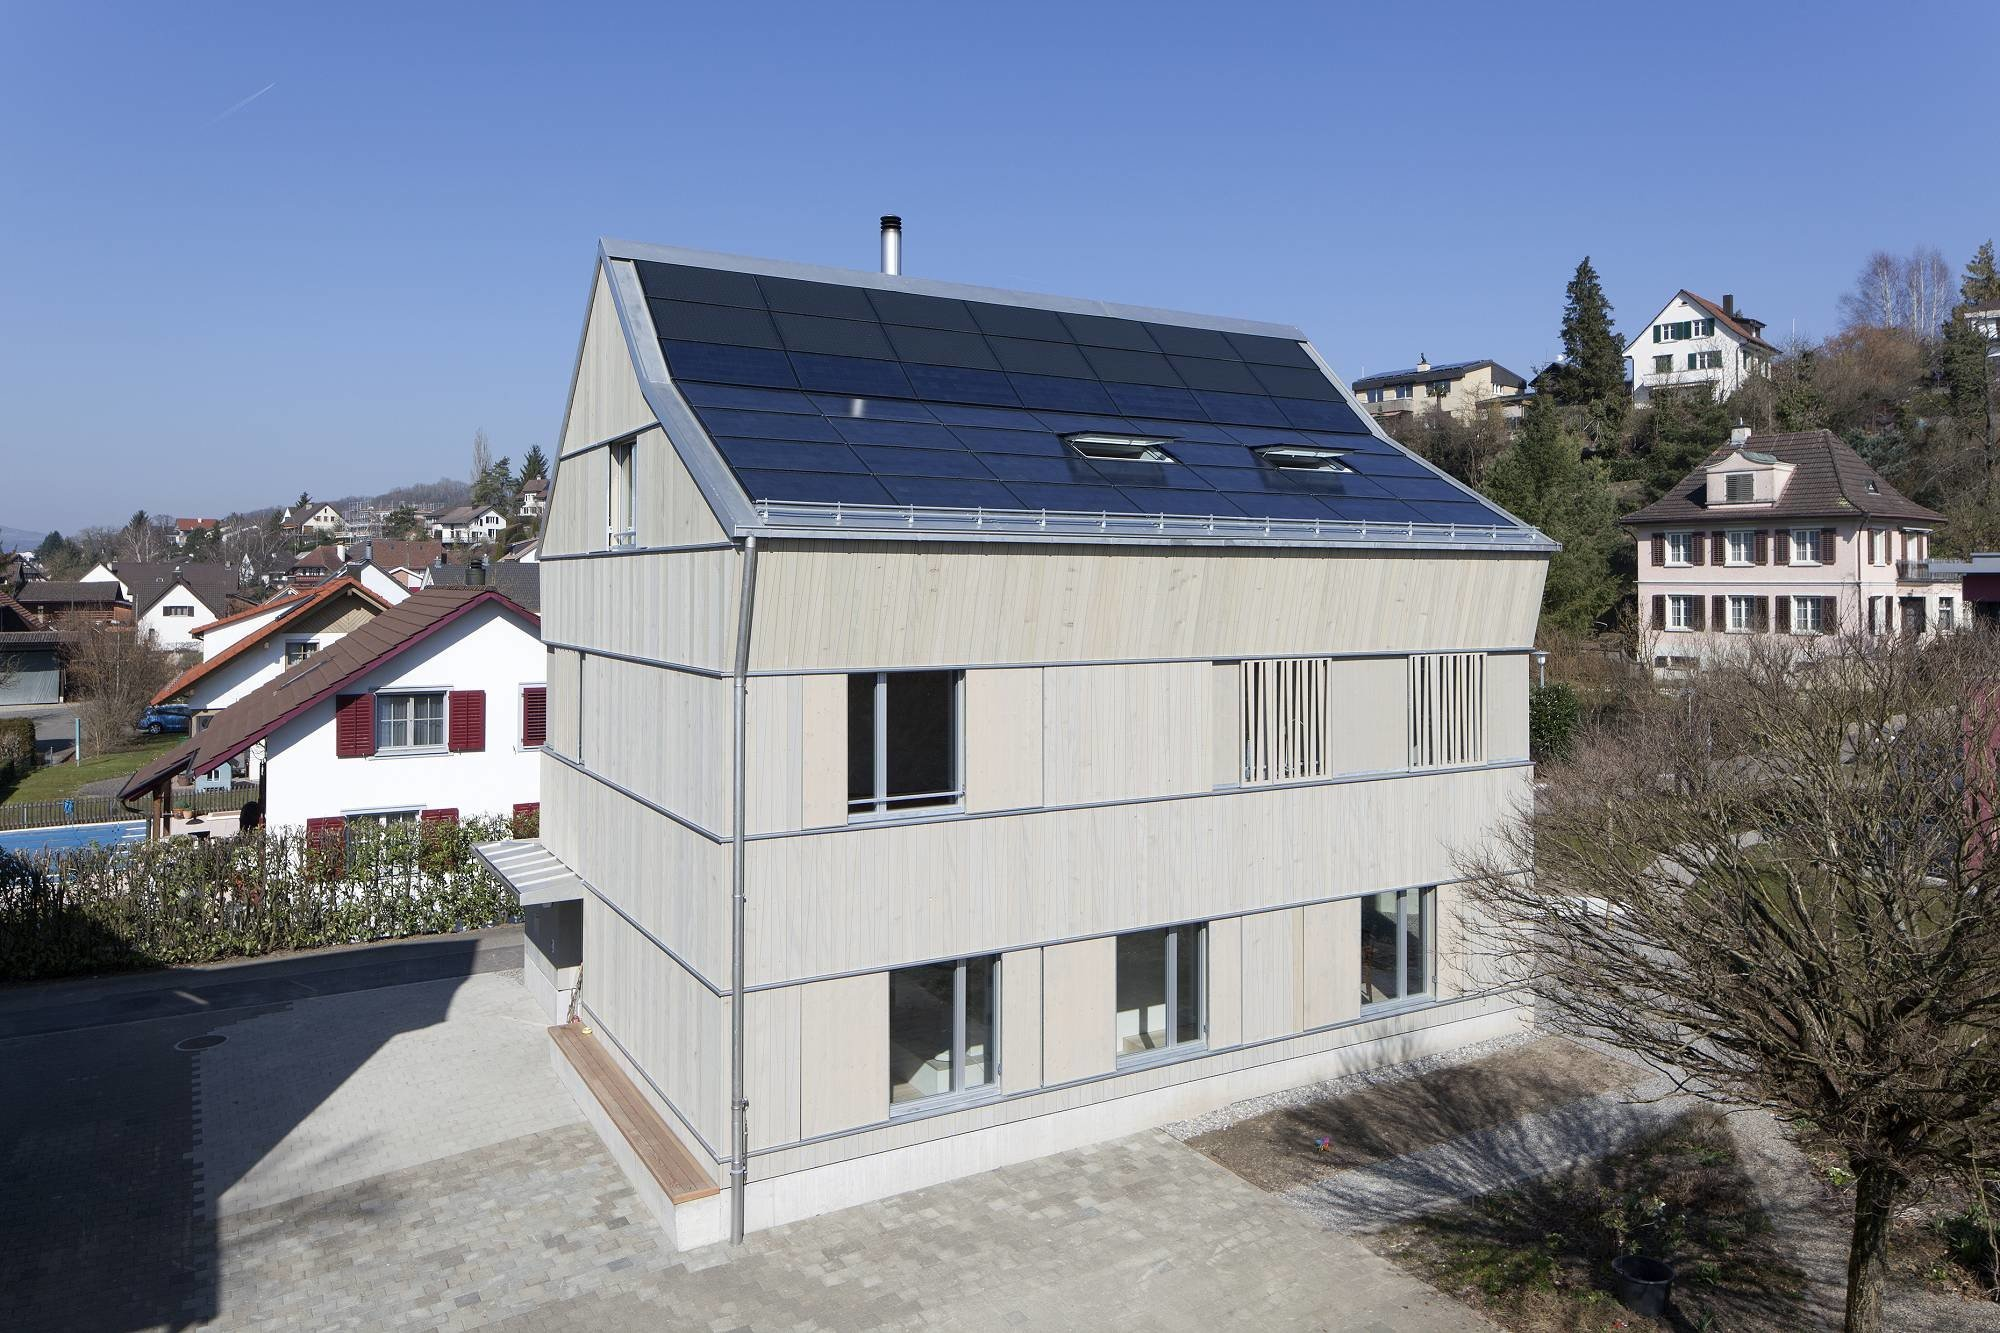 Photovoltaik als Dachdeckung | Geneigtes Dach | News ...